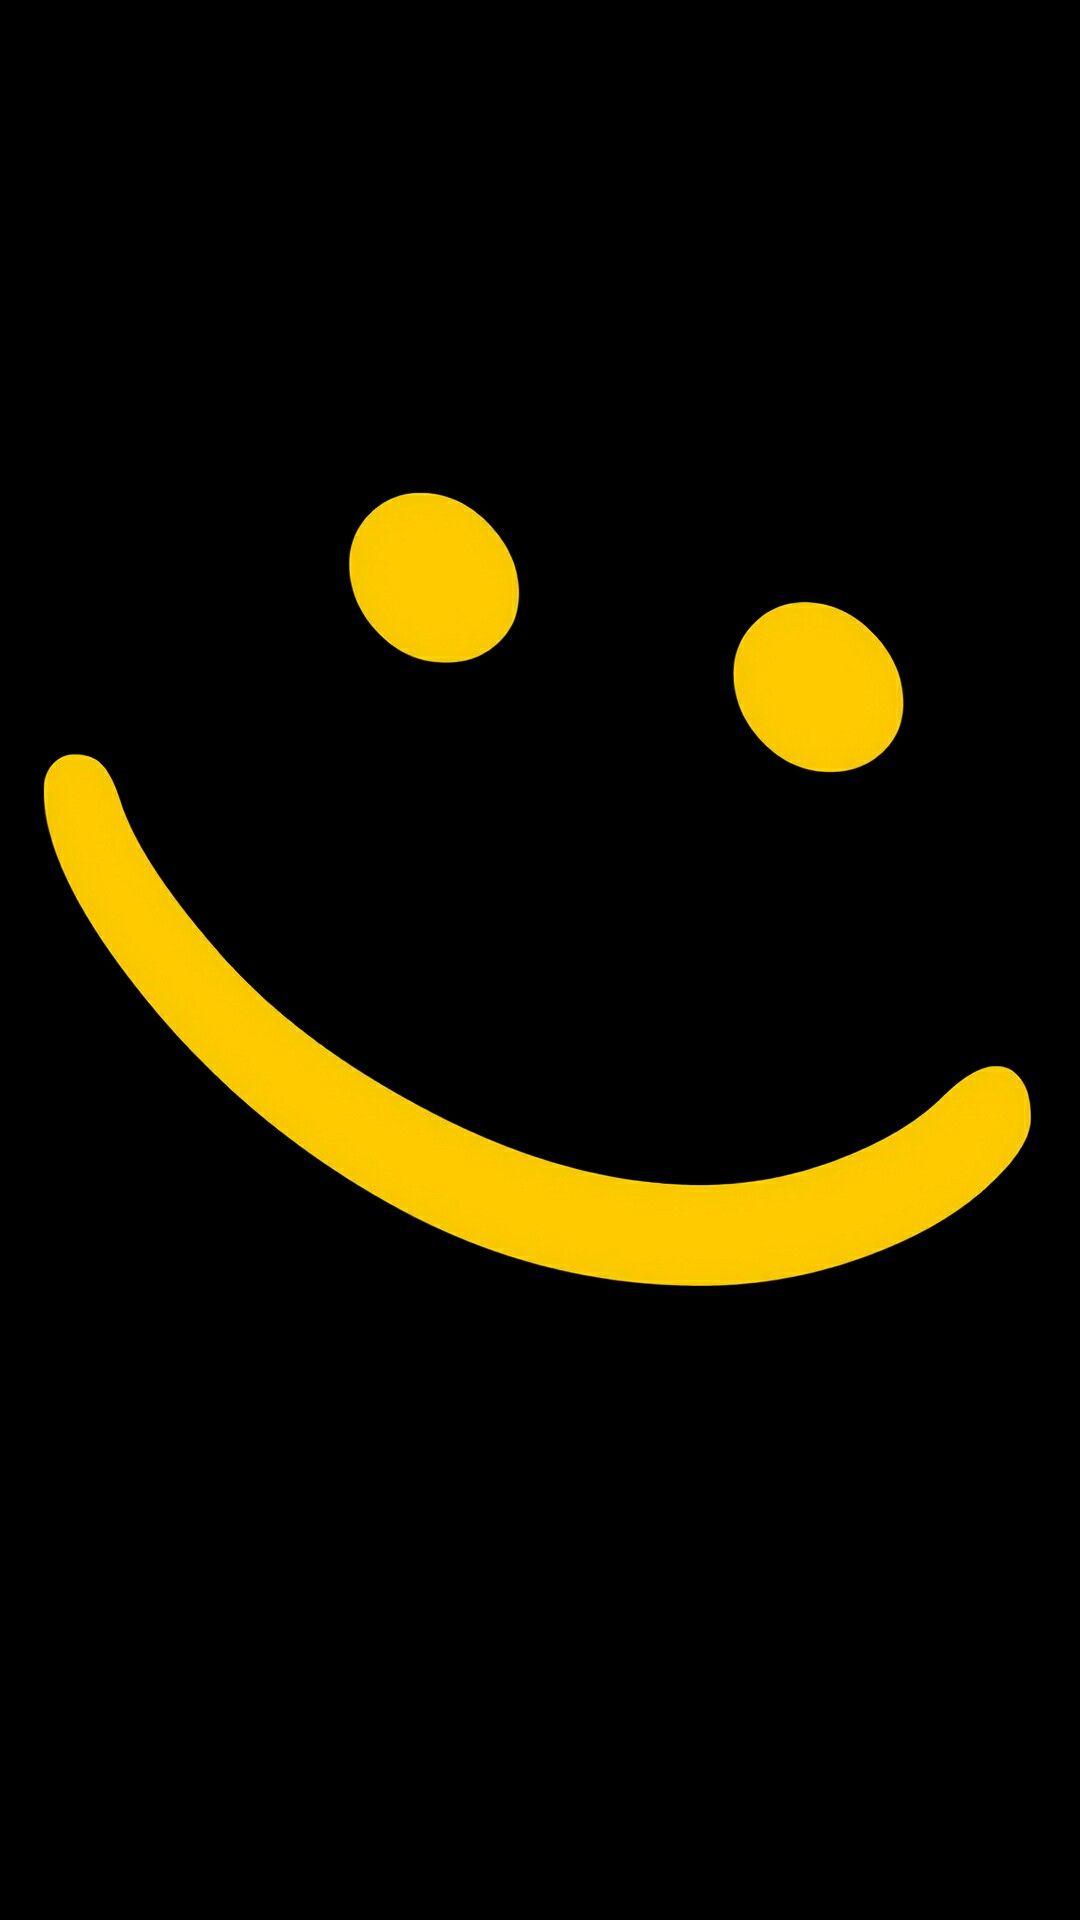 Smiley Face Emoji Wallpaper Iphone Emoji Wallpaper Iphone Wallpaper